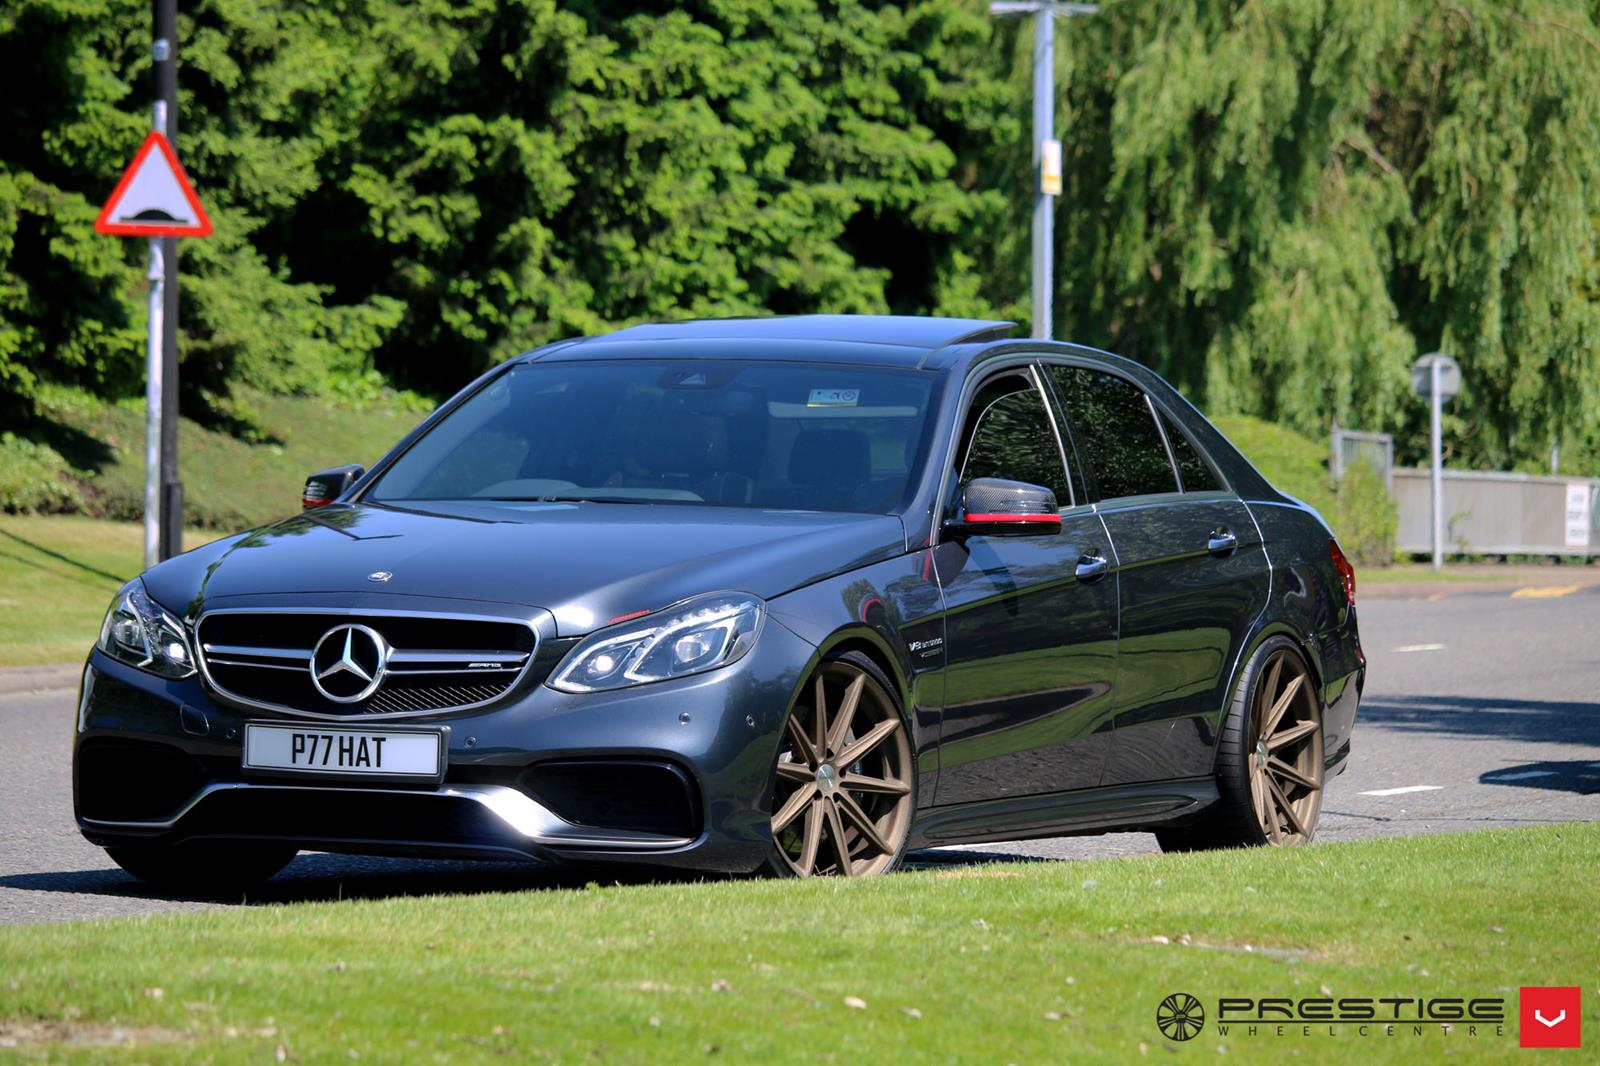 Mercedes benz w212 e63 amg on vossen vfs10 wheels benztuning for Mercedes benz e350 amg